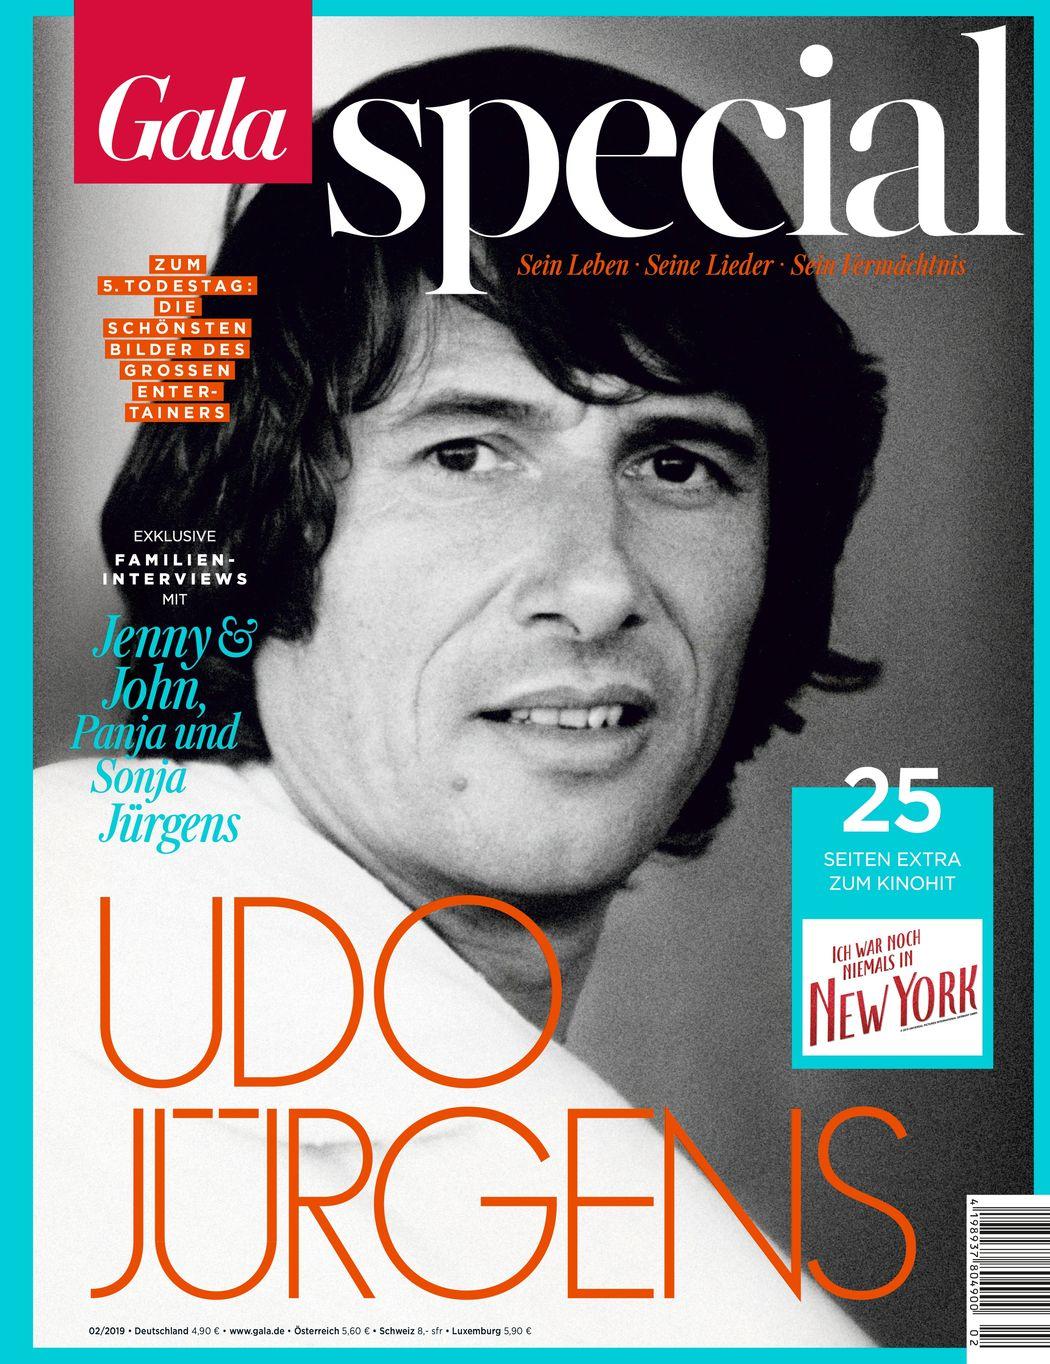 Gala Cover, Special mit Udo Jürgens